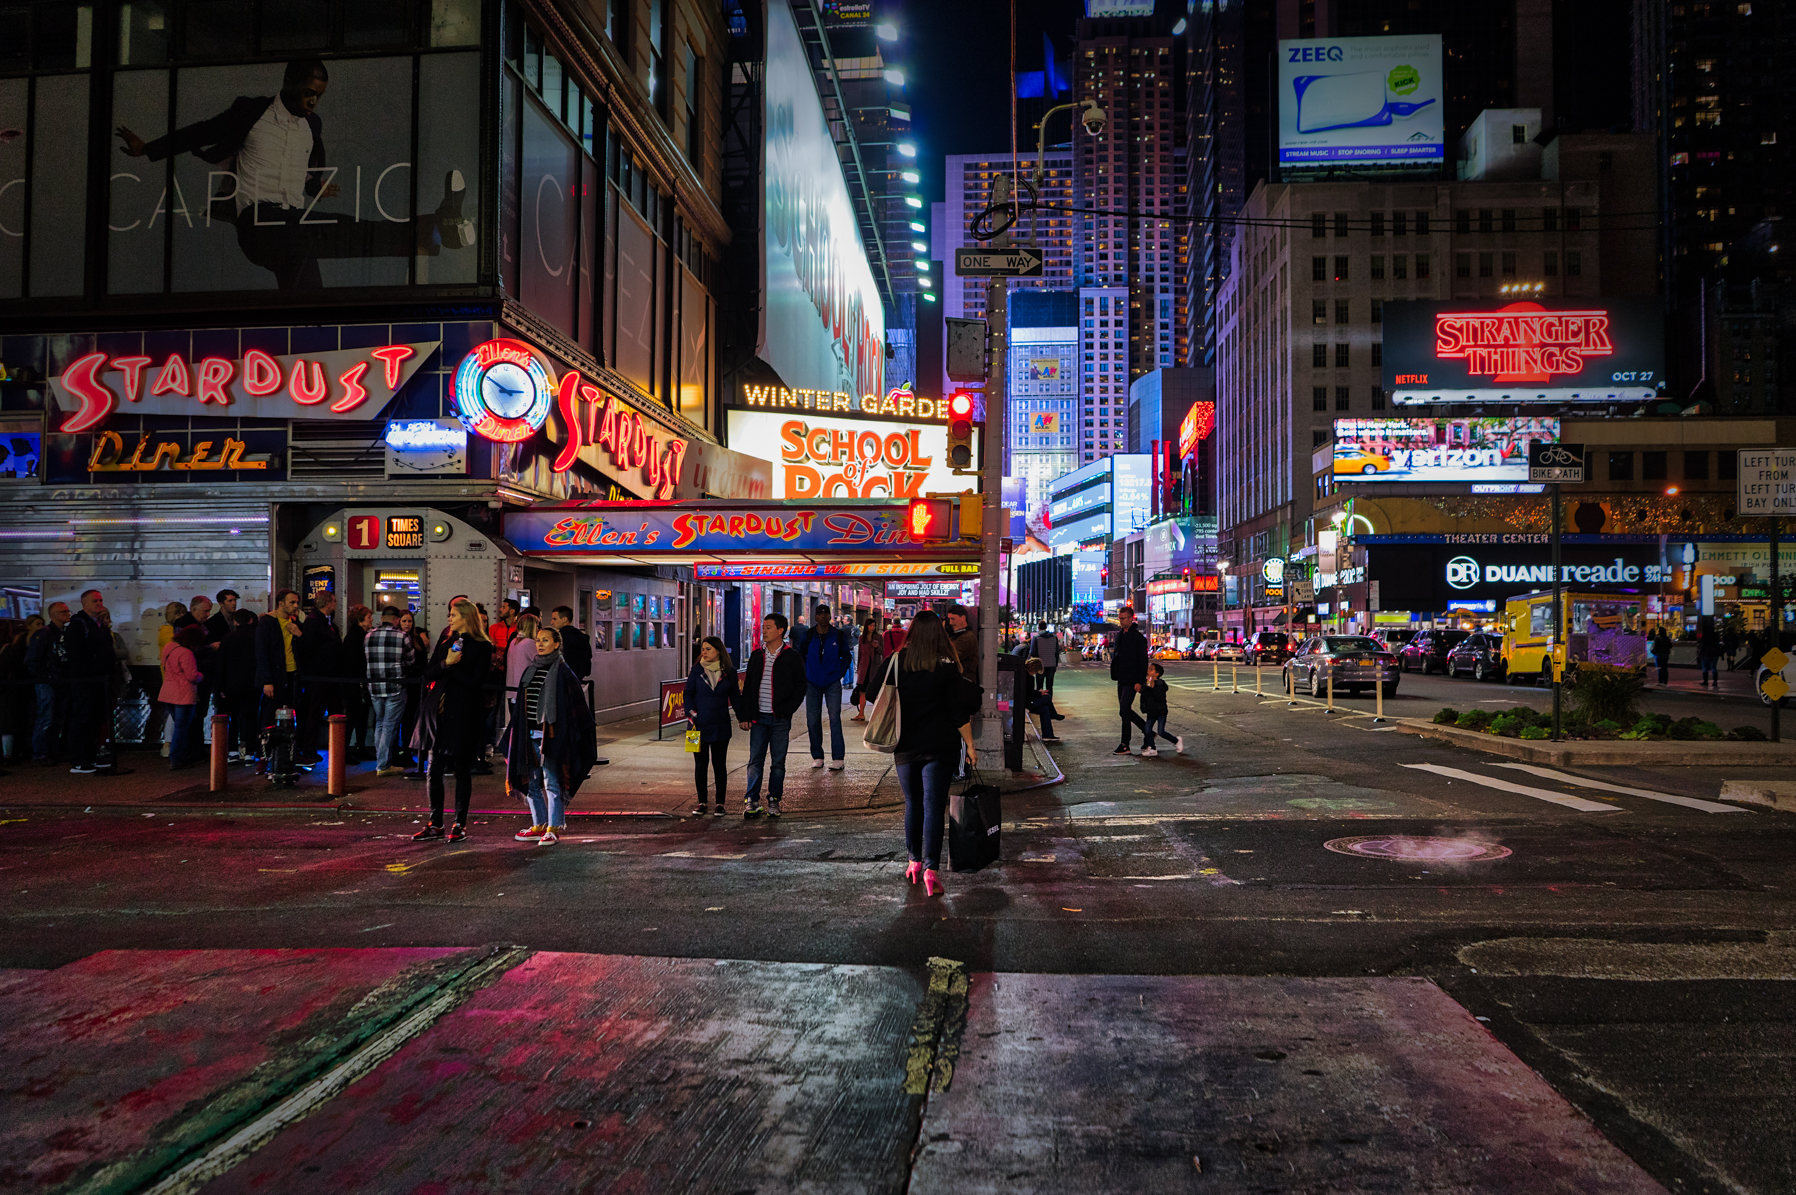 NYC-Oct2-17-PPE-street-scene-HDR.jpg